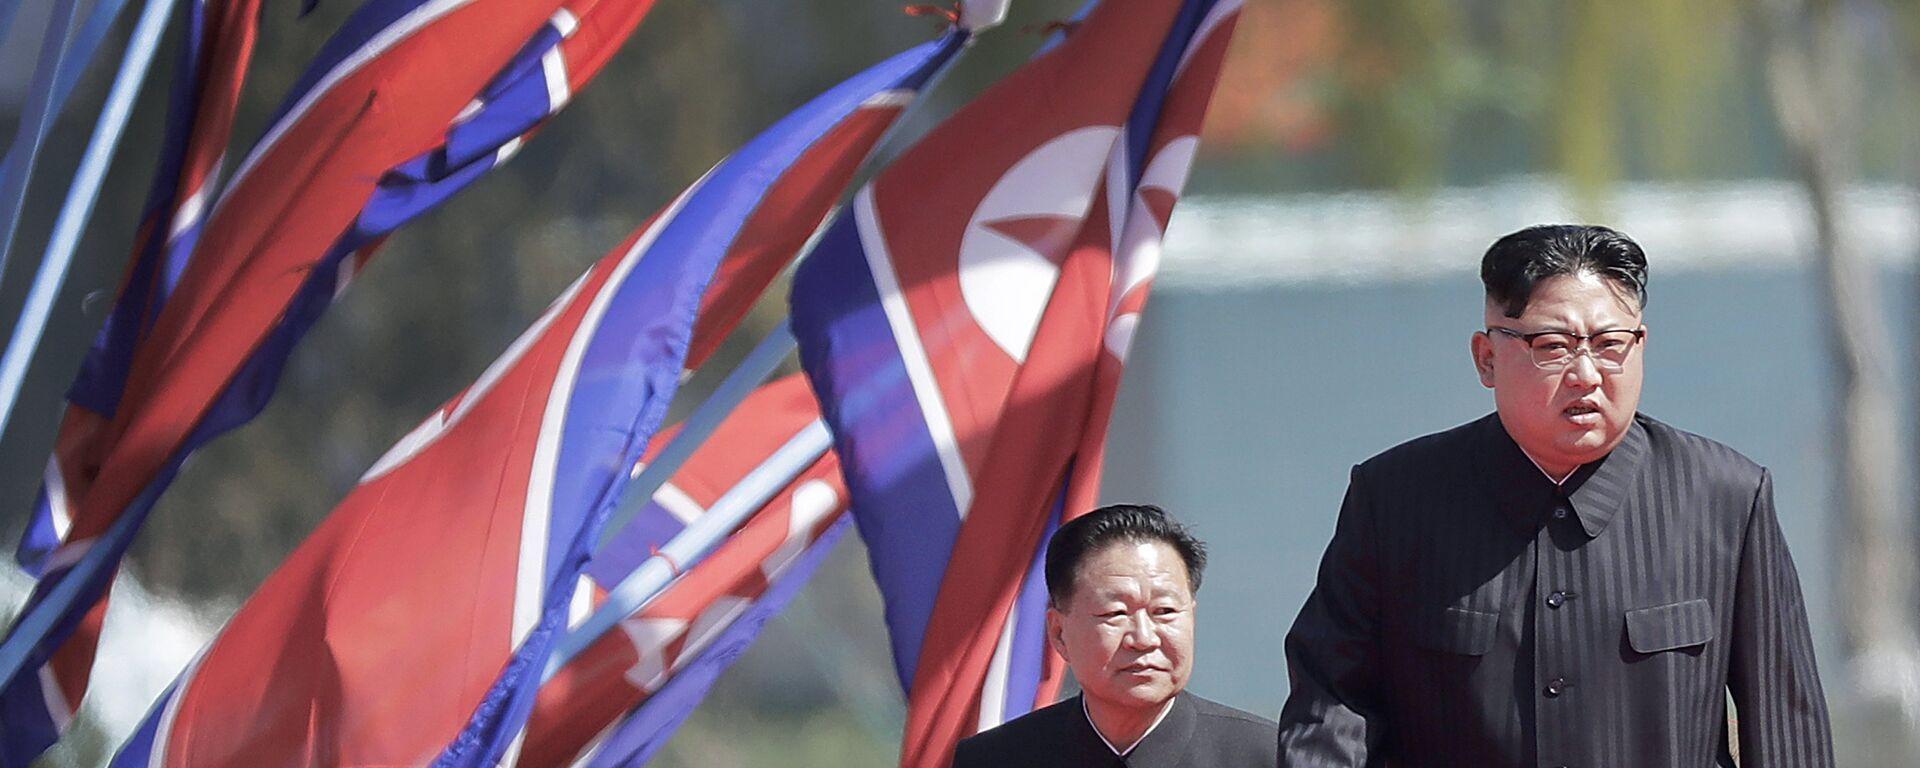 Kim Jong-un, líder de Corea del Norte - Sputnik Mundo, 1920, 29.09.2021